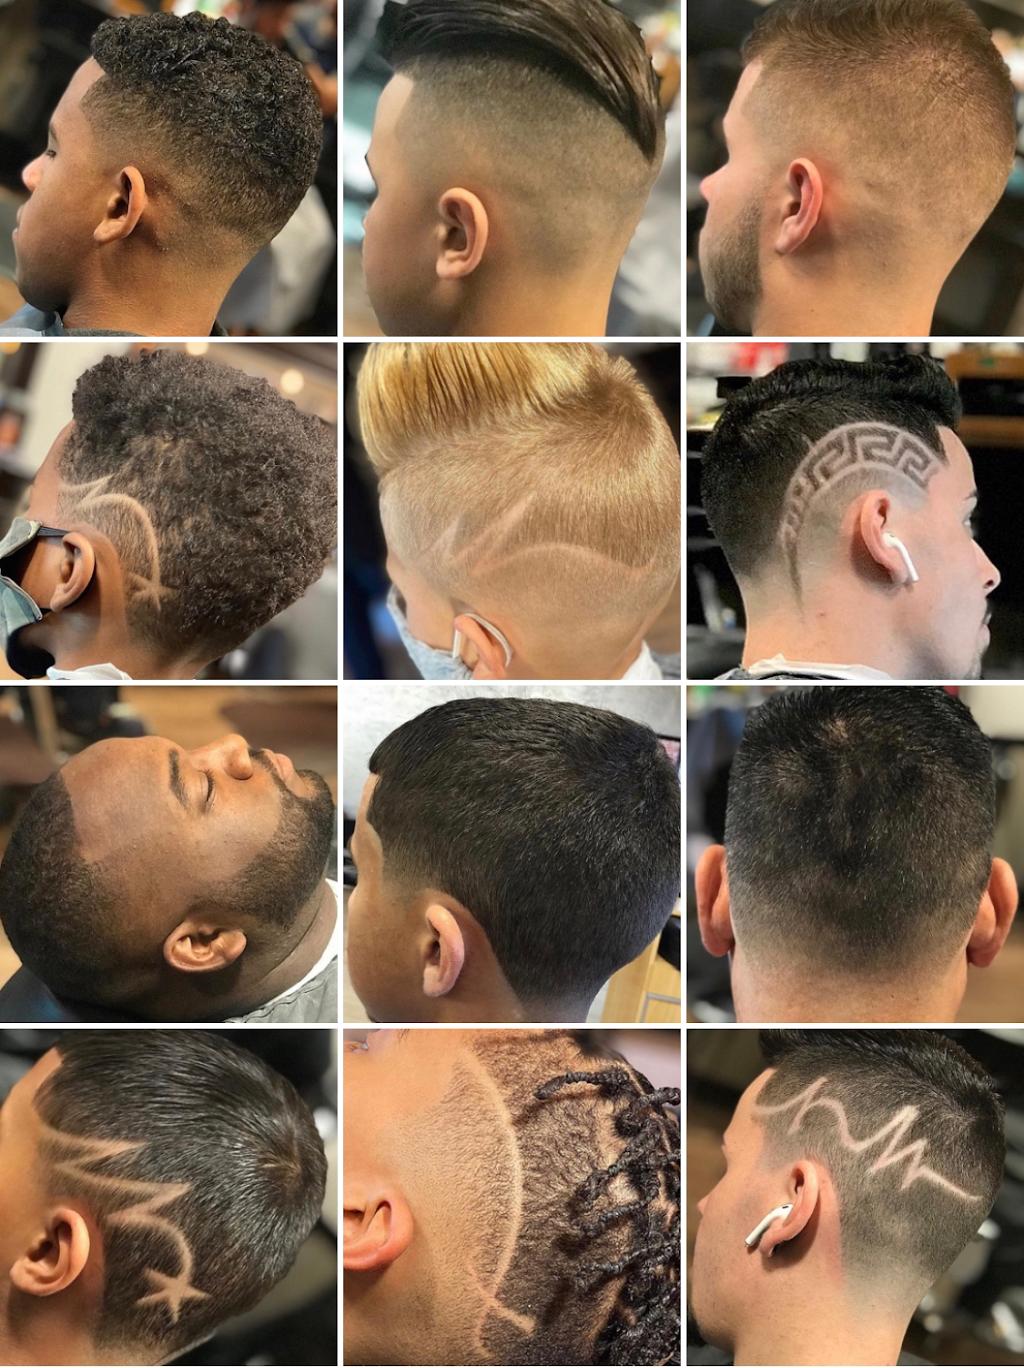 Rafy your Barber Hair Studio - hair care  | Photo 7 of 8 | Address: 10140 Clear Vista St Studio 7, Orlando, FL 32832, USA | Phone: (787) 459-5149